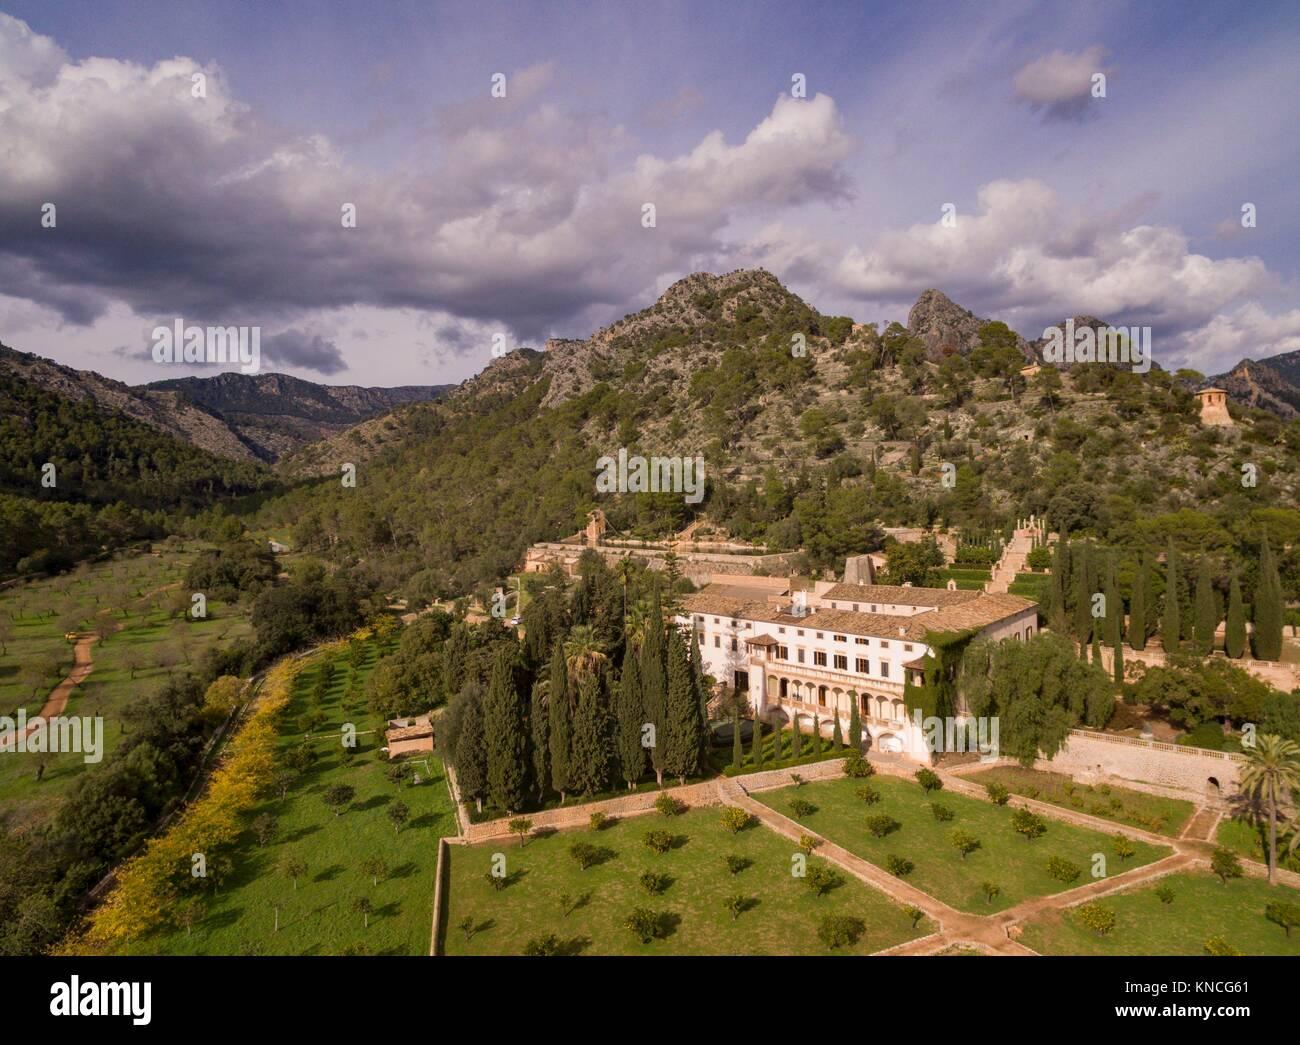 Raixa, possession of Arab origin, Bunyola municipality, Mallorca, Balearic Islands, Spain. - Stock Image